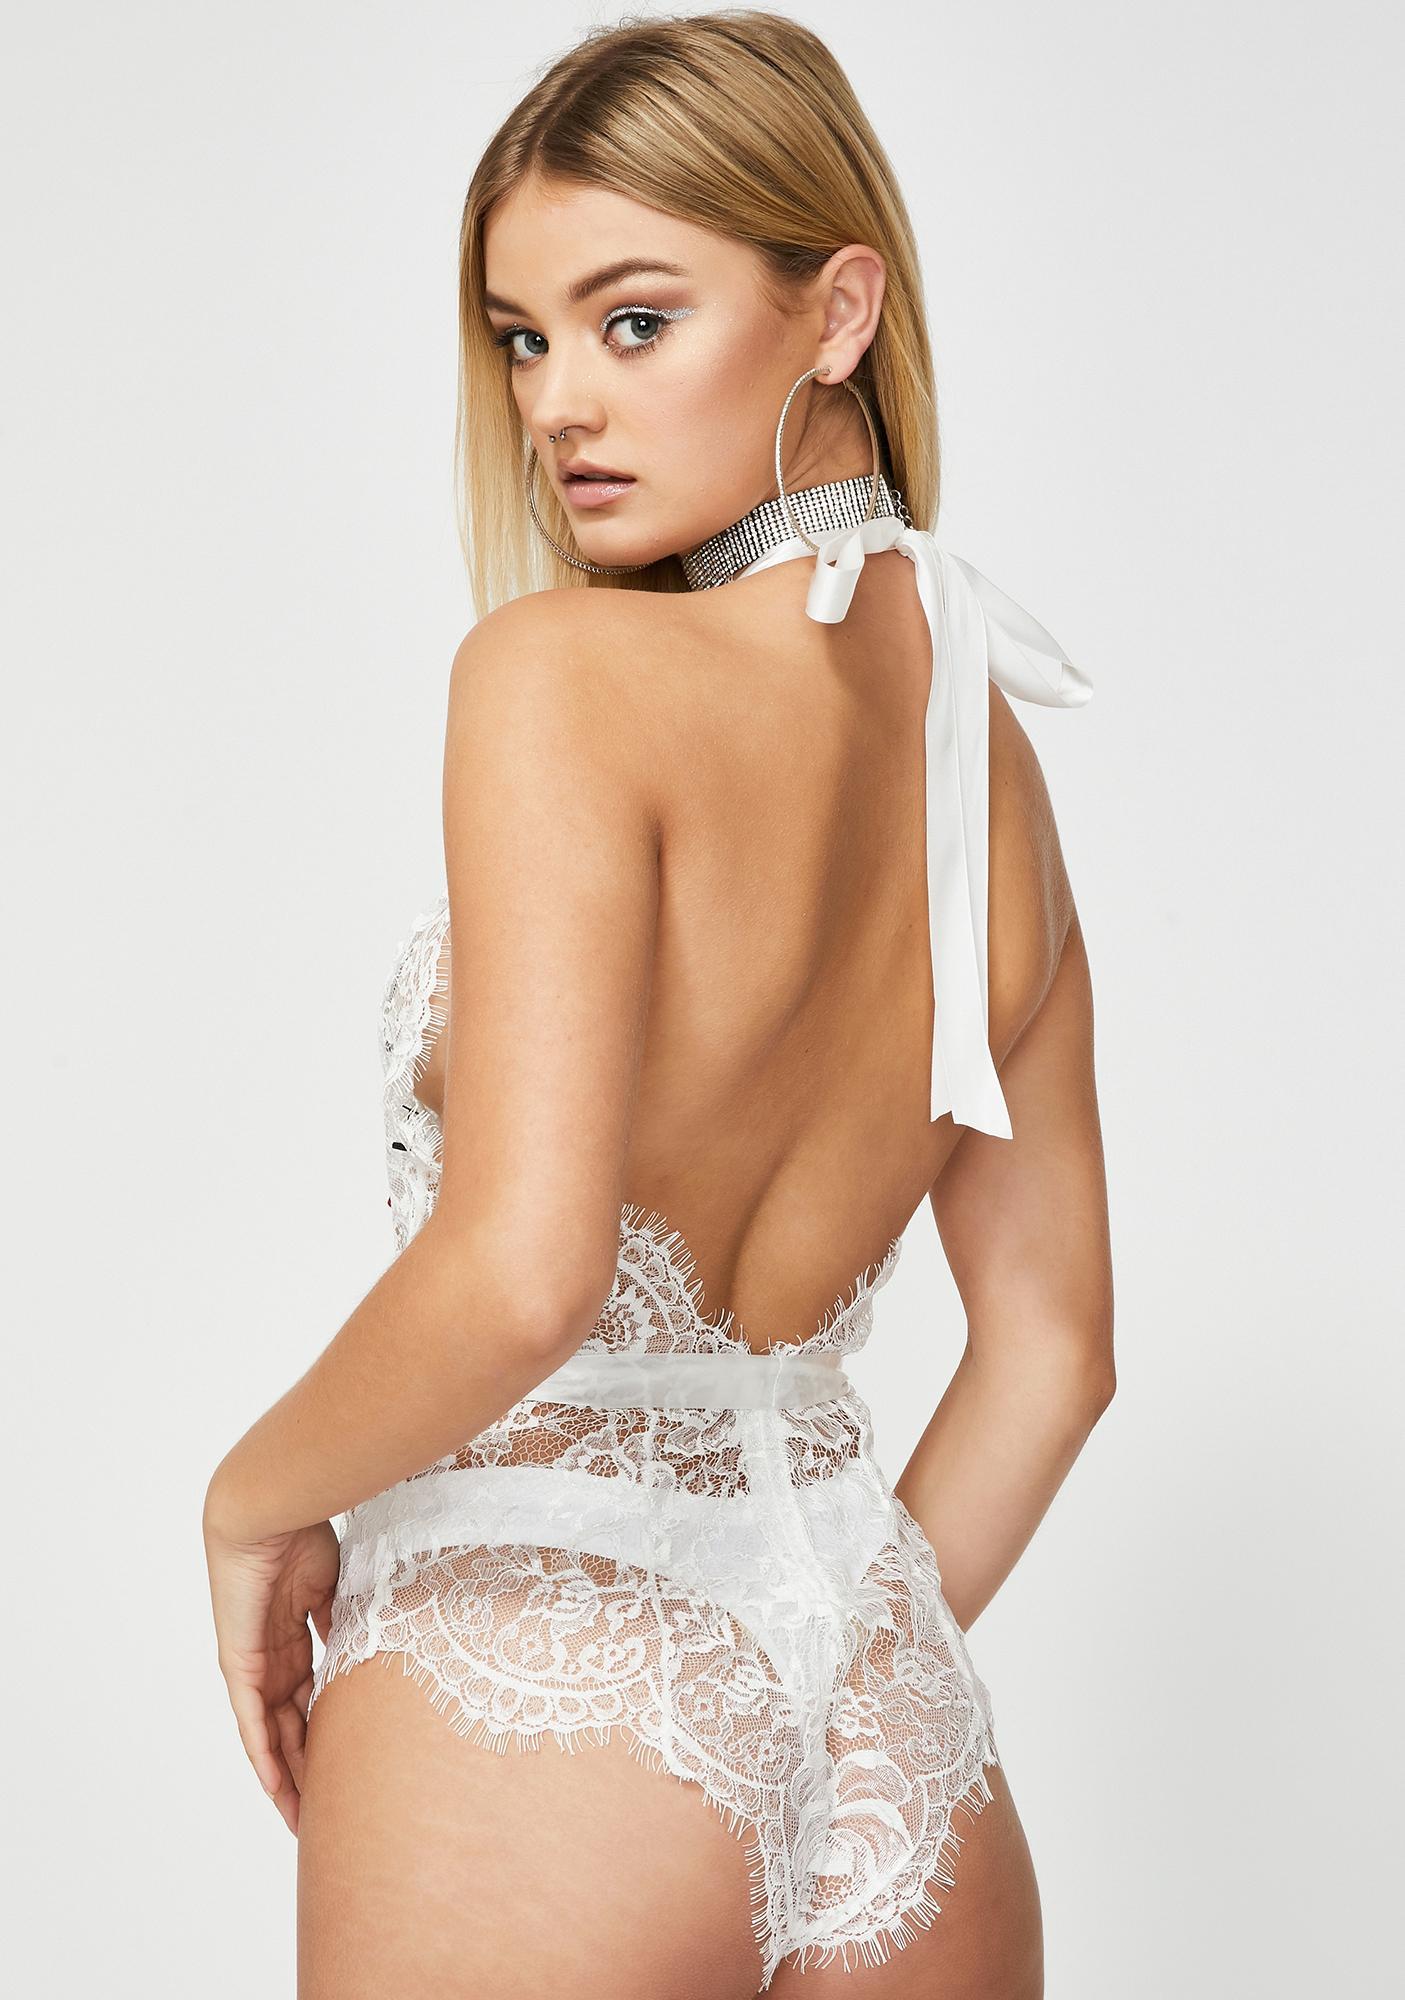 Oh la la Cheri Angel Very Good Night Lace Teddy